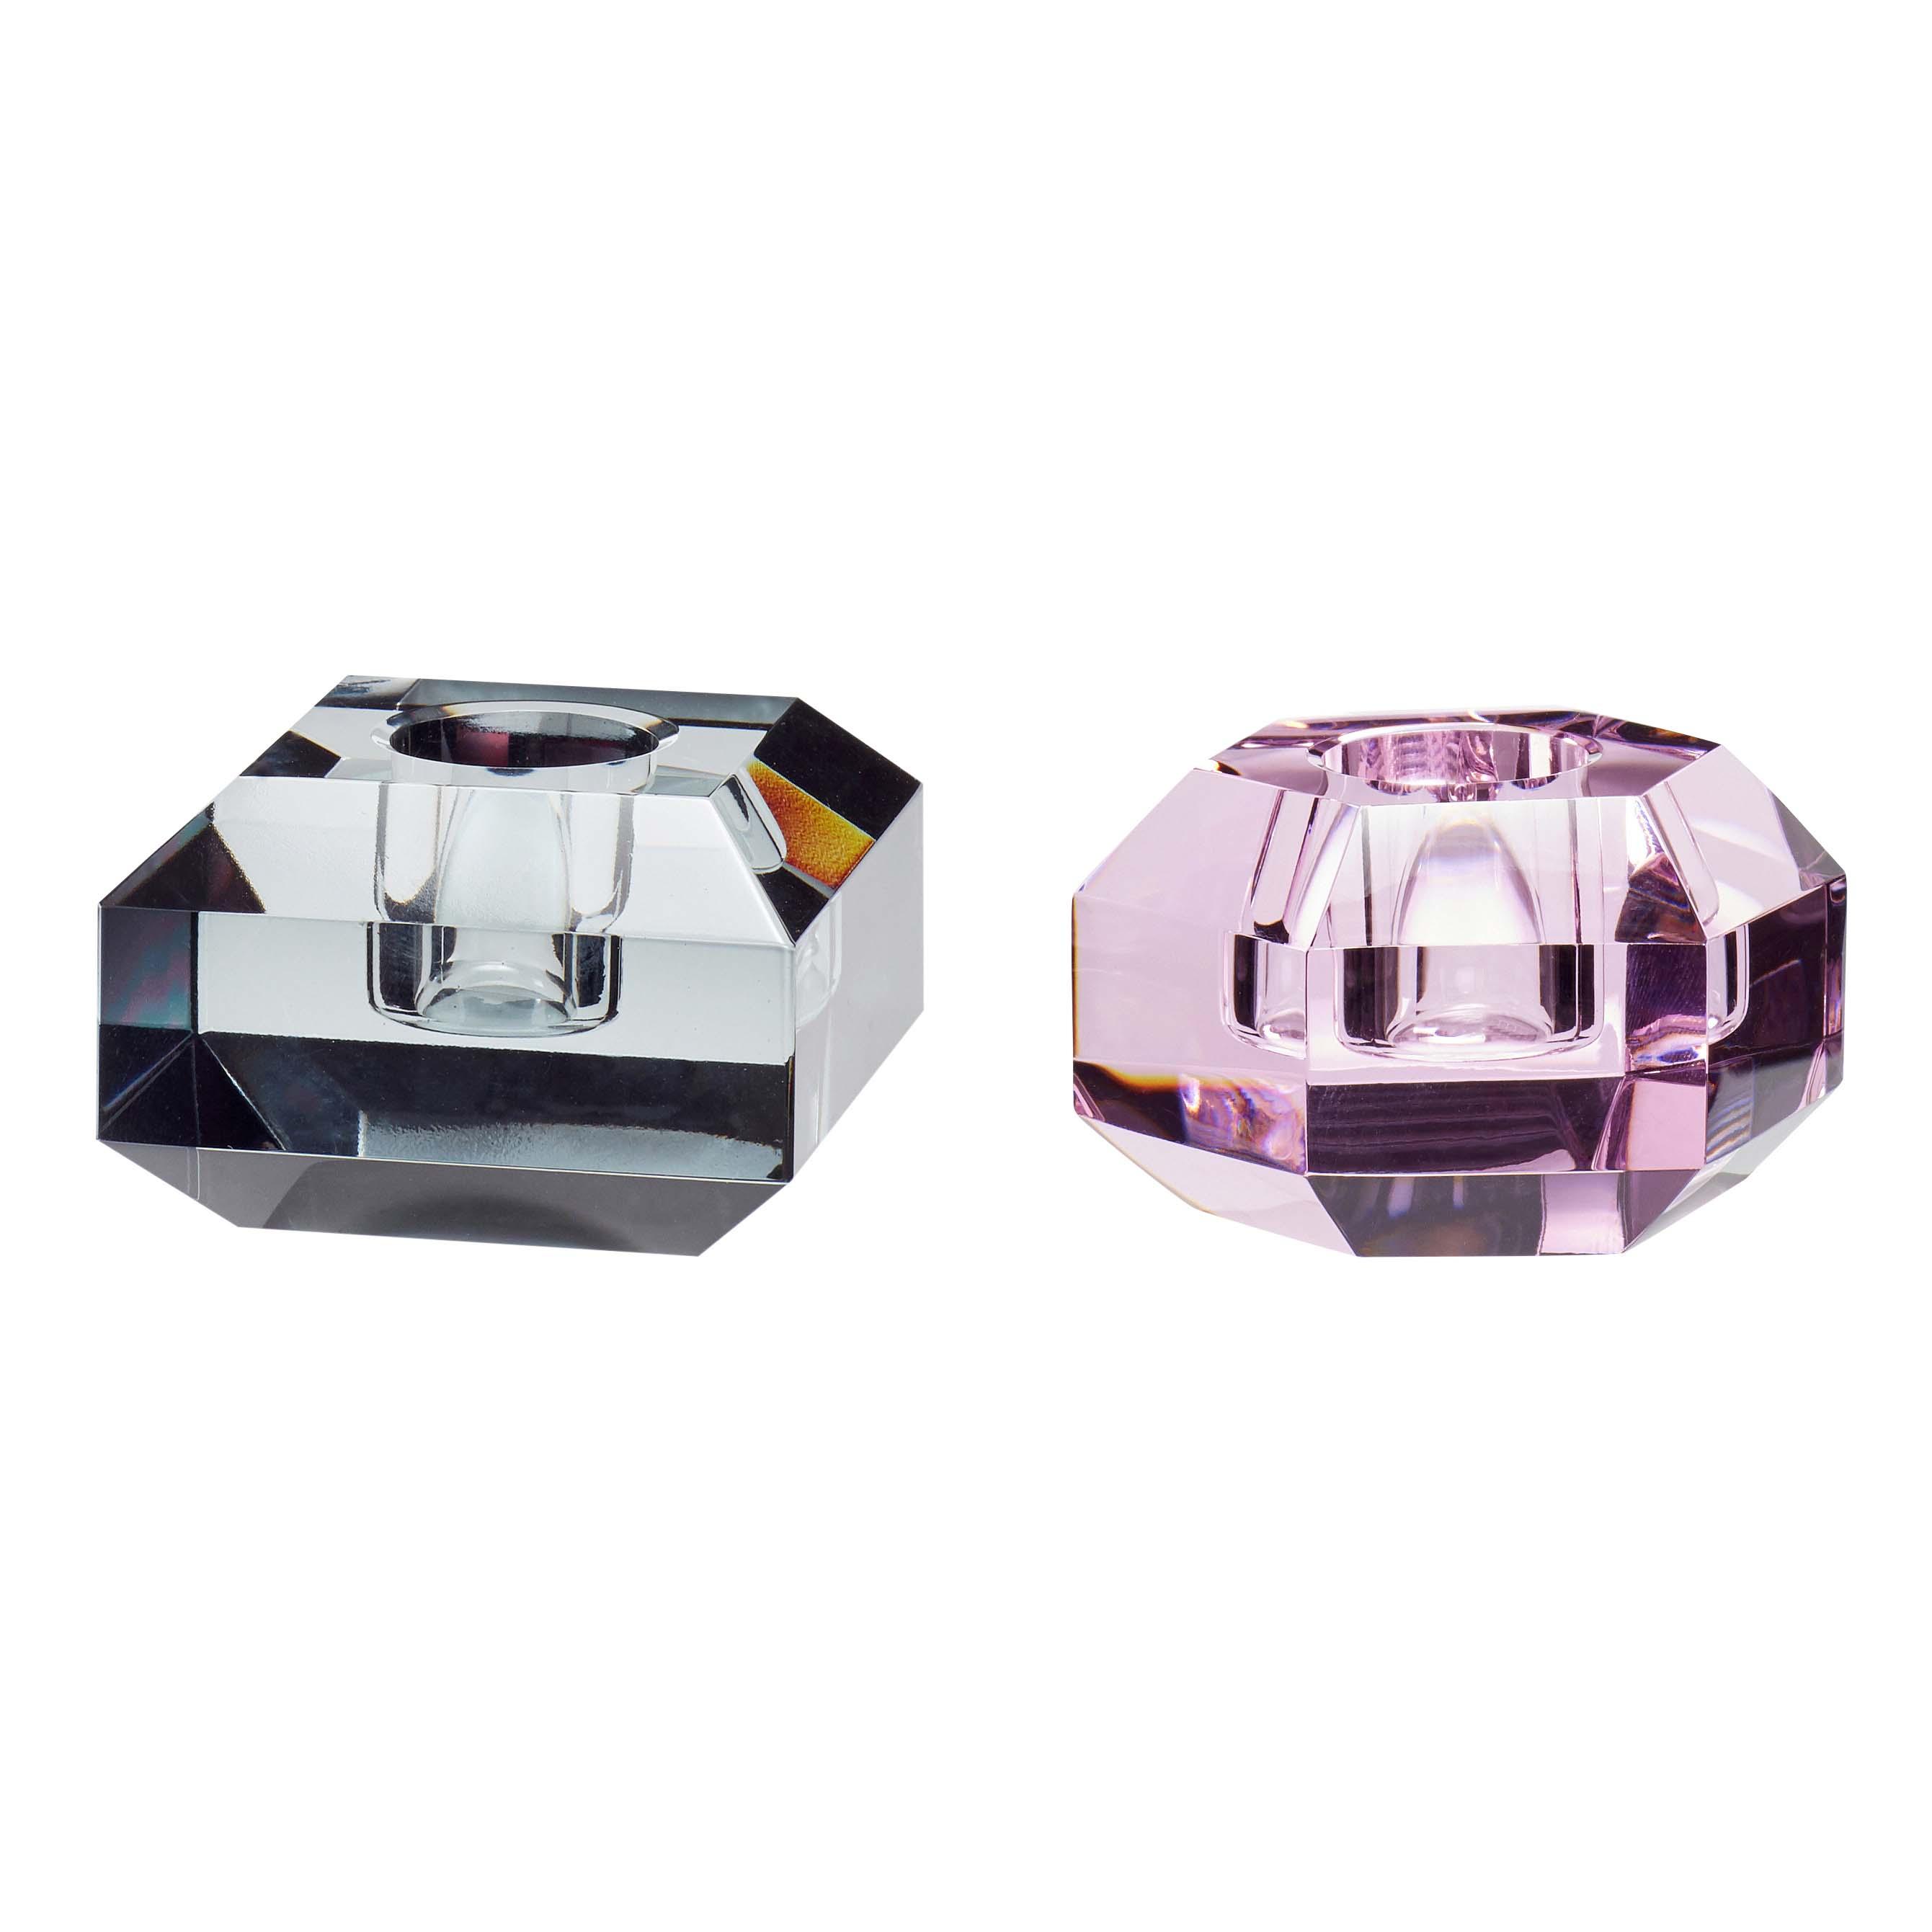 Image of Hübsch lysestage i glas - sæt á 2 stk - pink og smoke